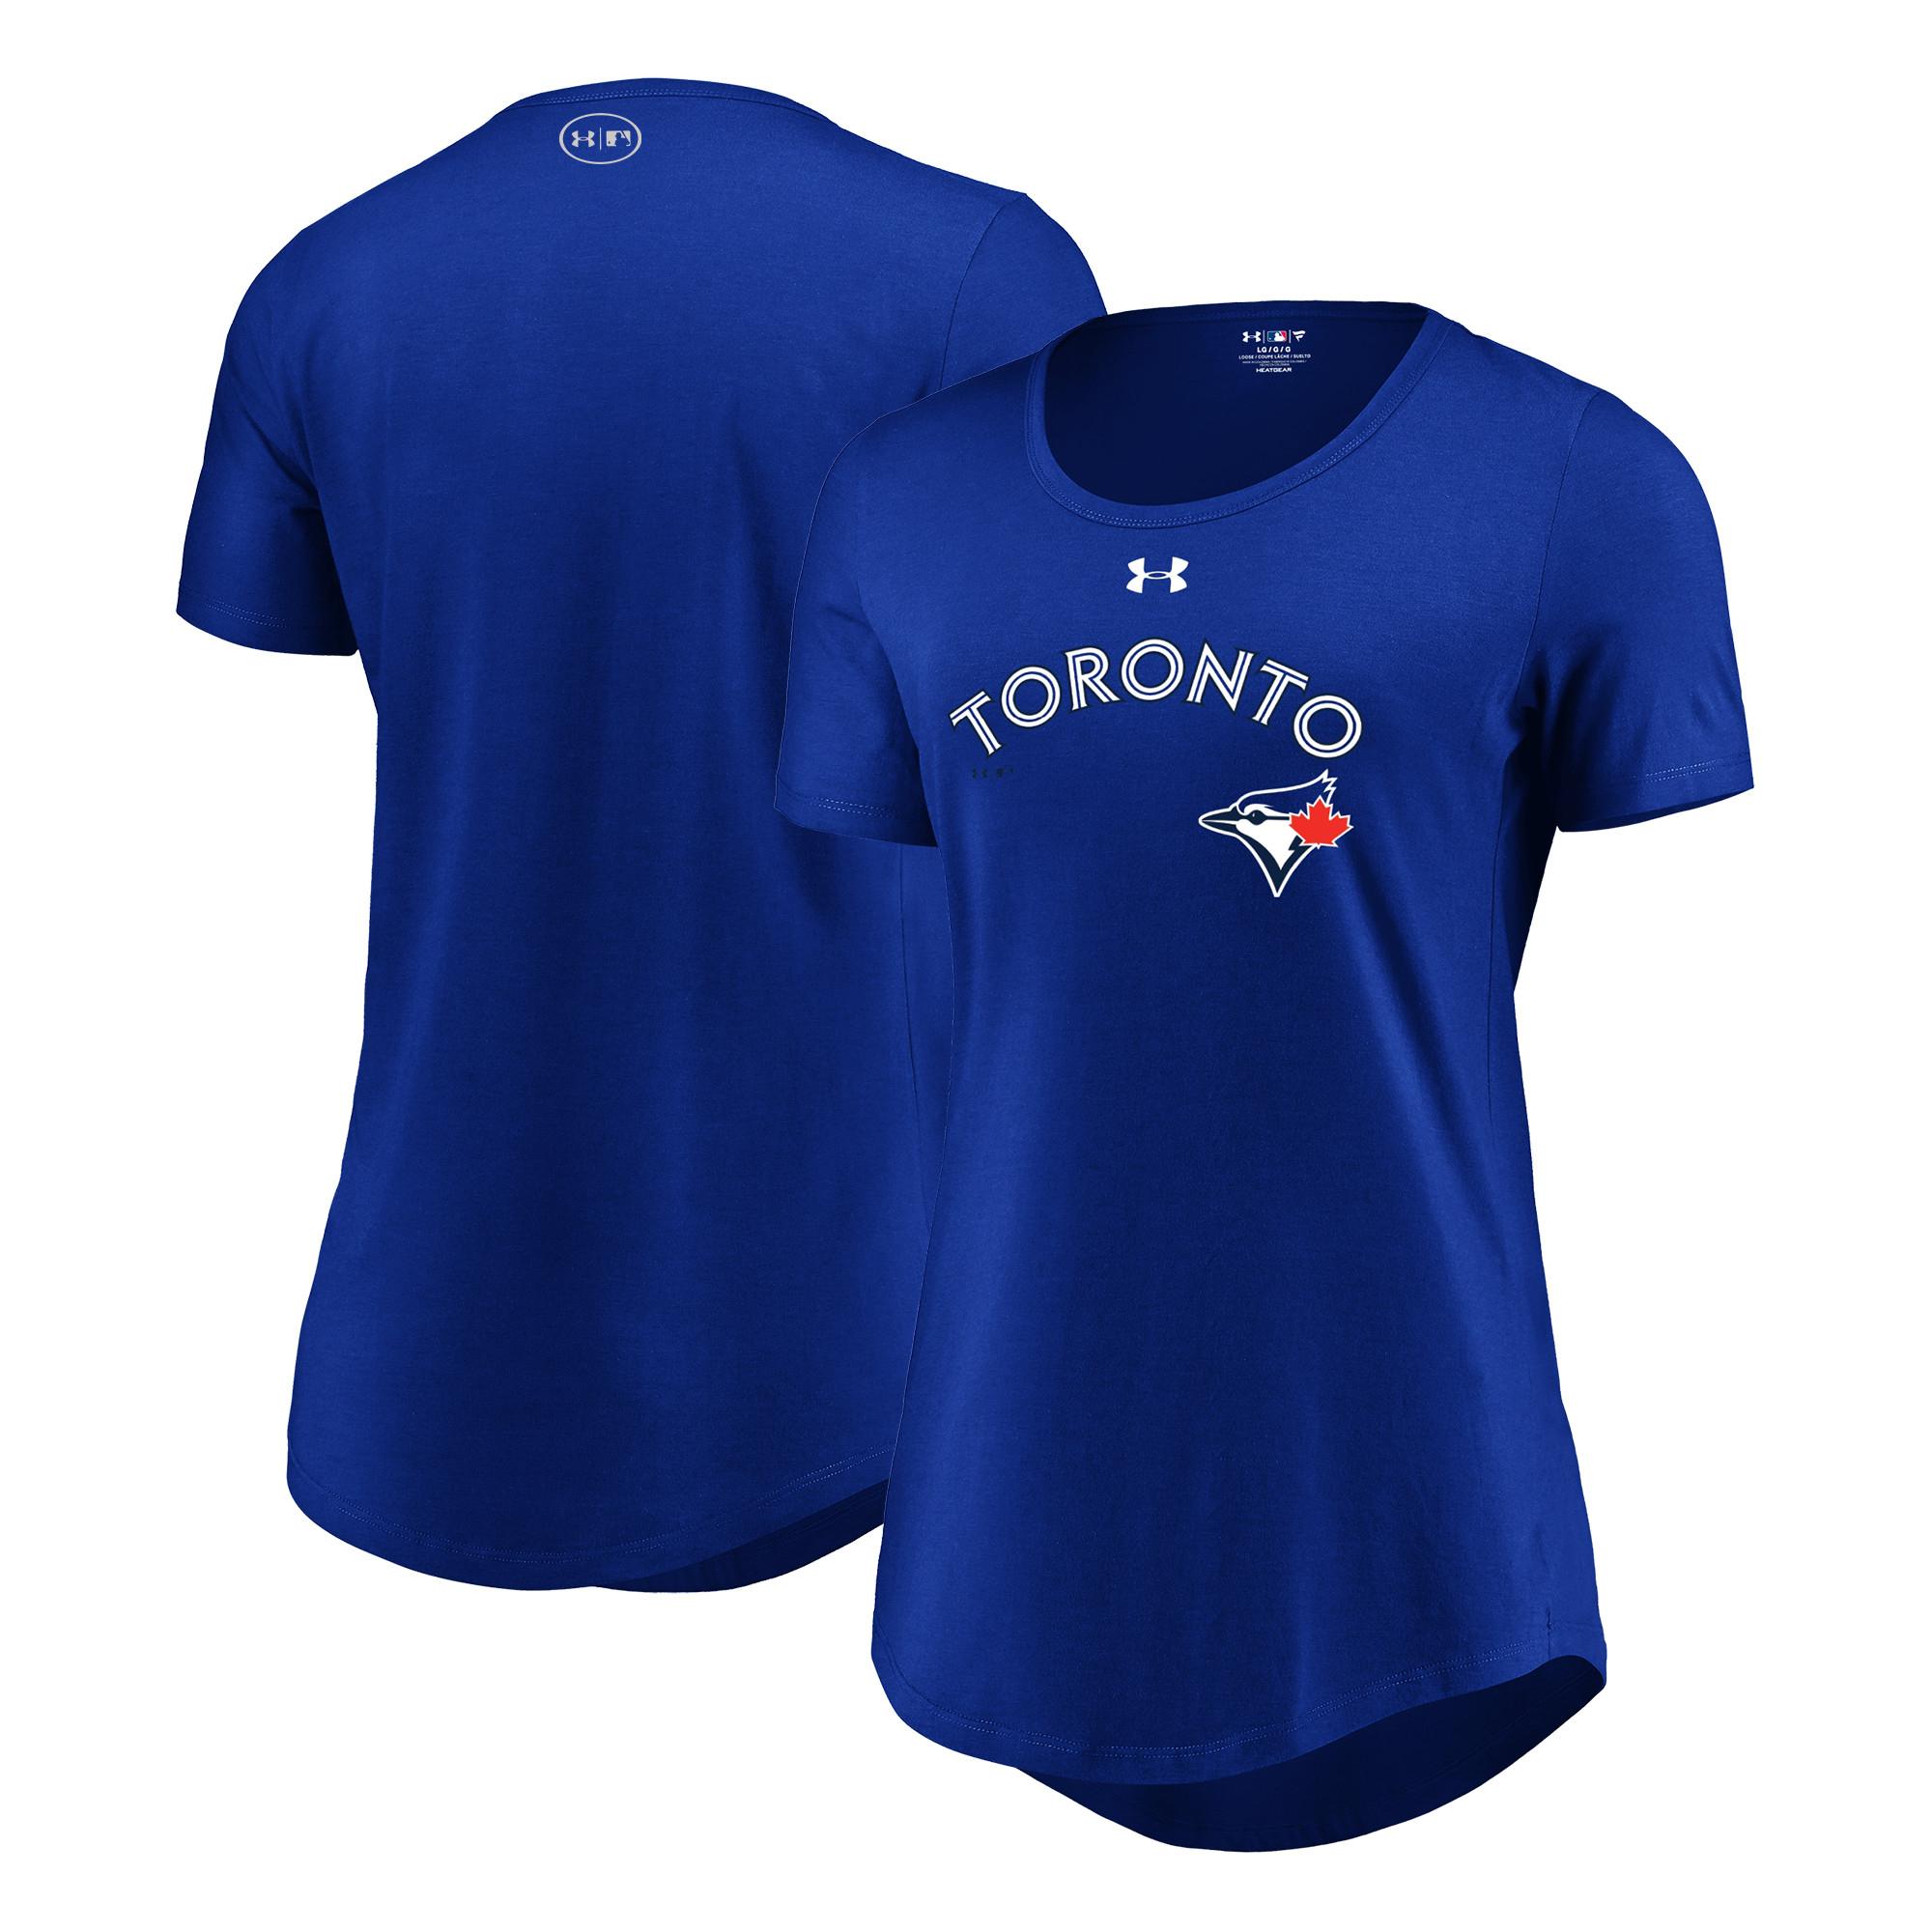 Toronto Blue Jays Under Armour Women's Passion Road Team Font Scoop Performance Tri-Blend T-Shirt - Royal